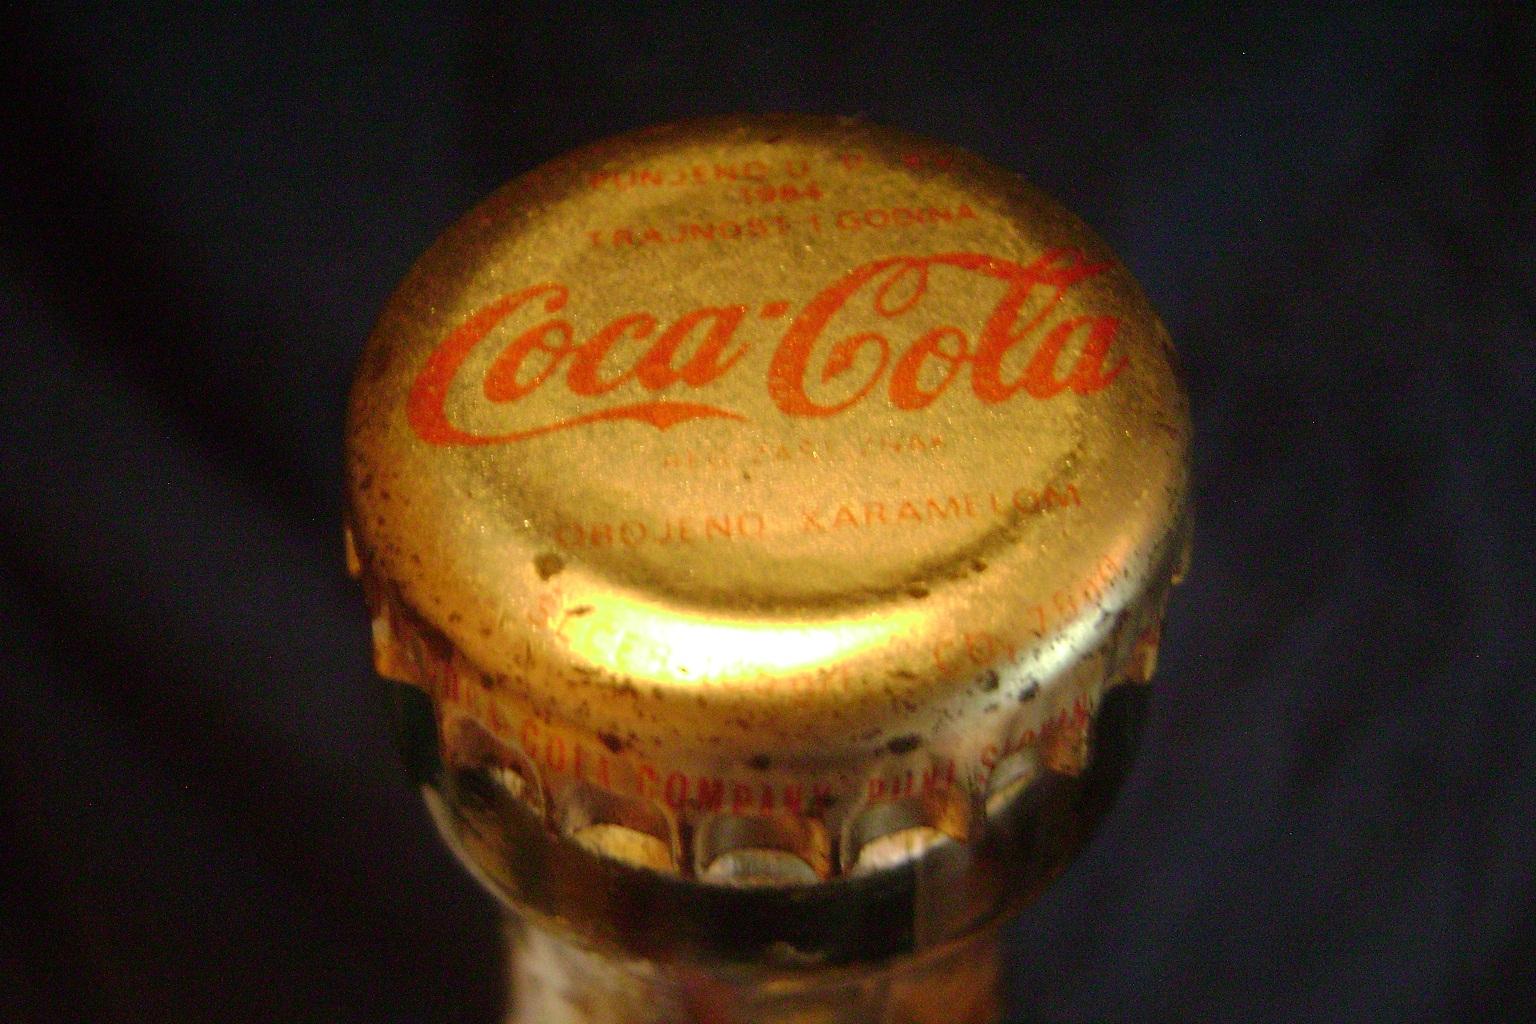 Coca_Cola_kriva_flasa_1984_4.JPG